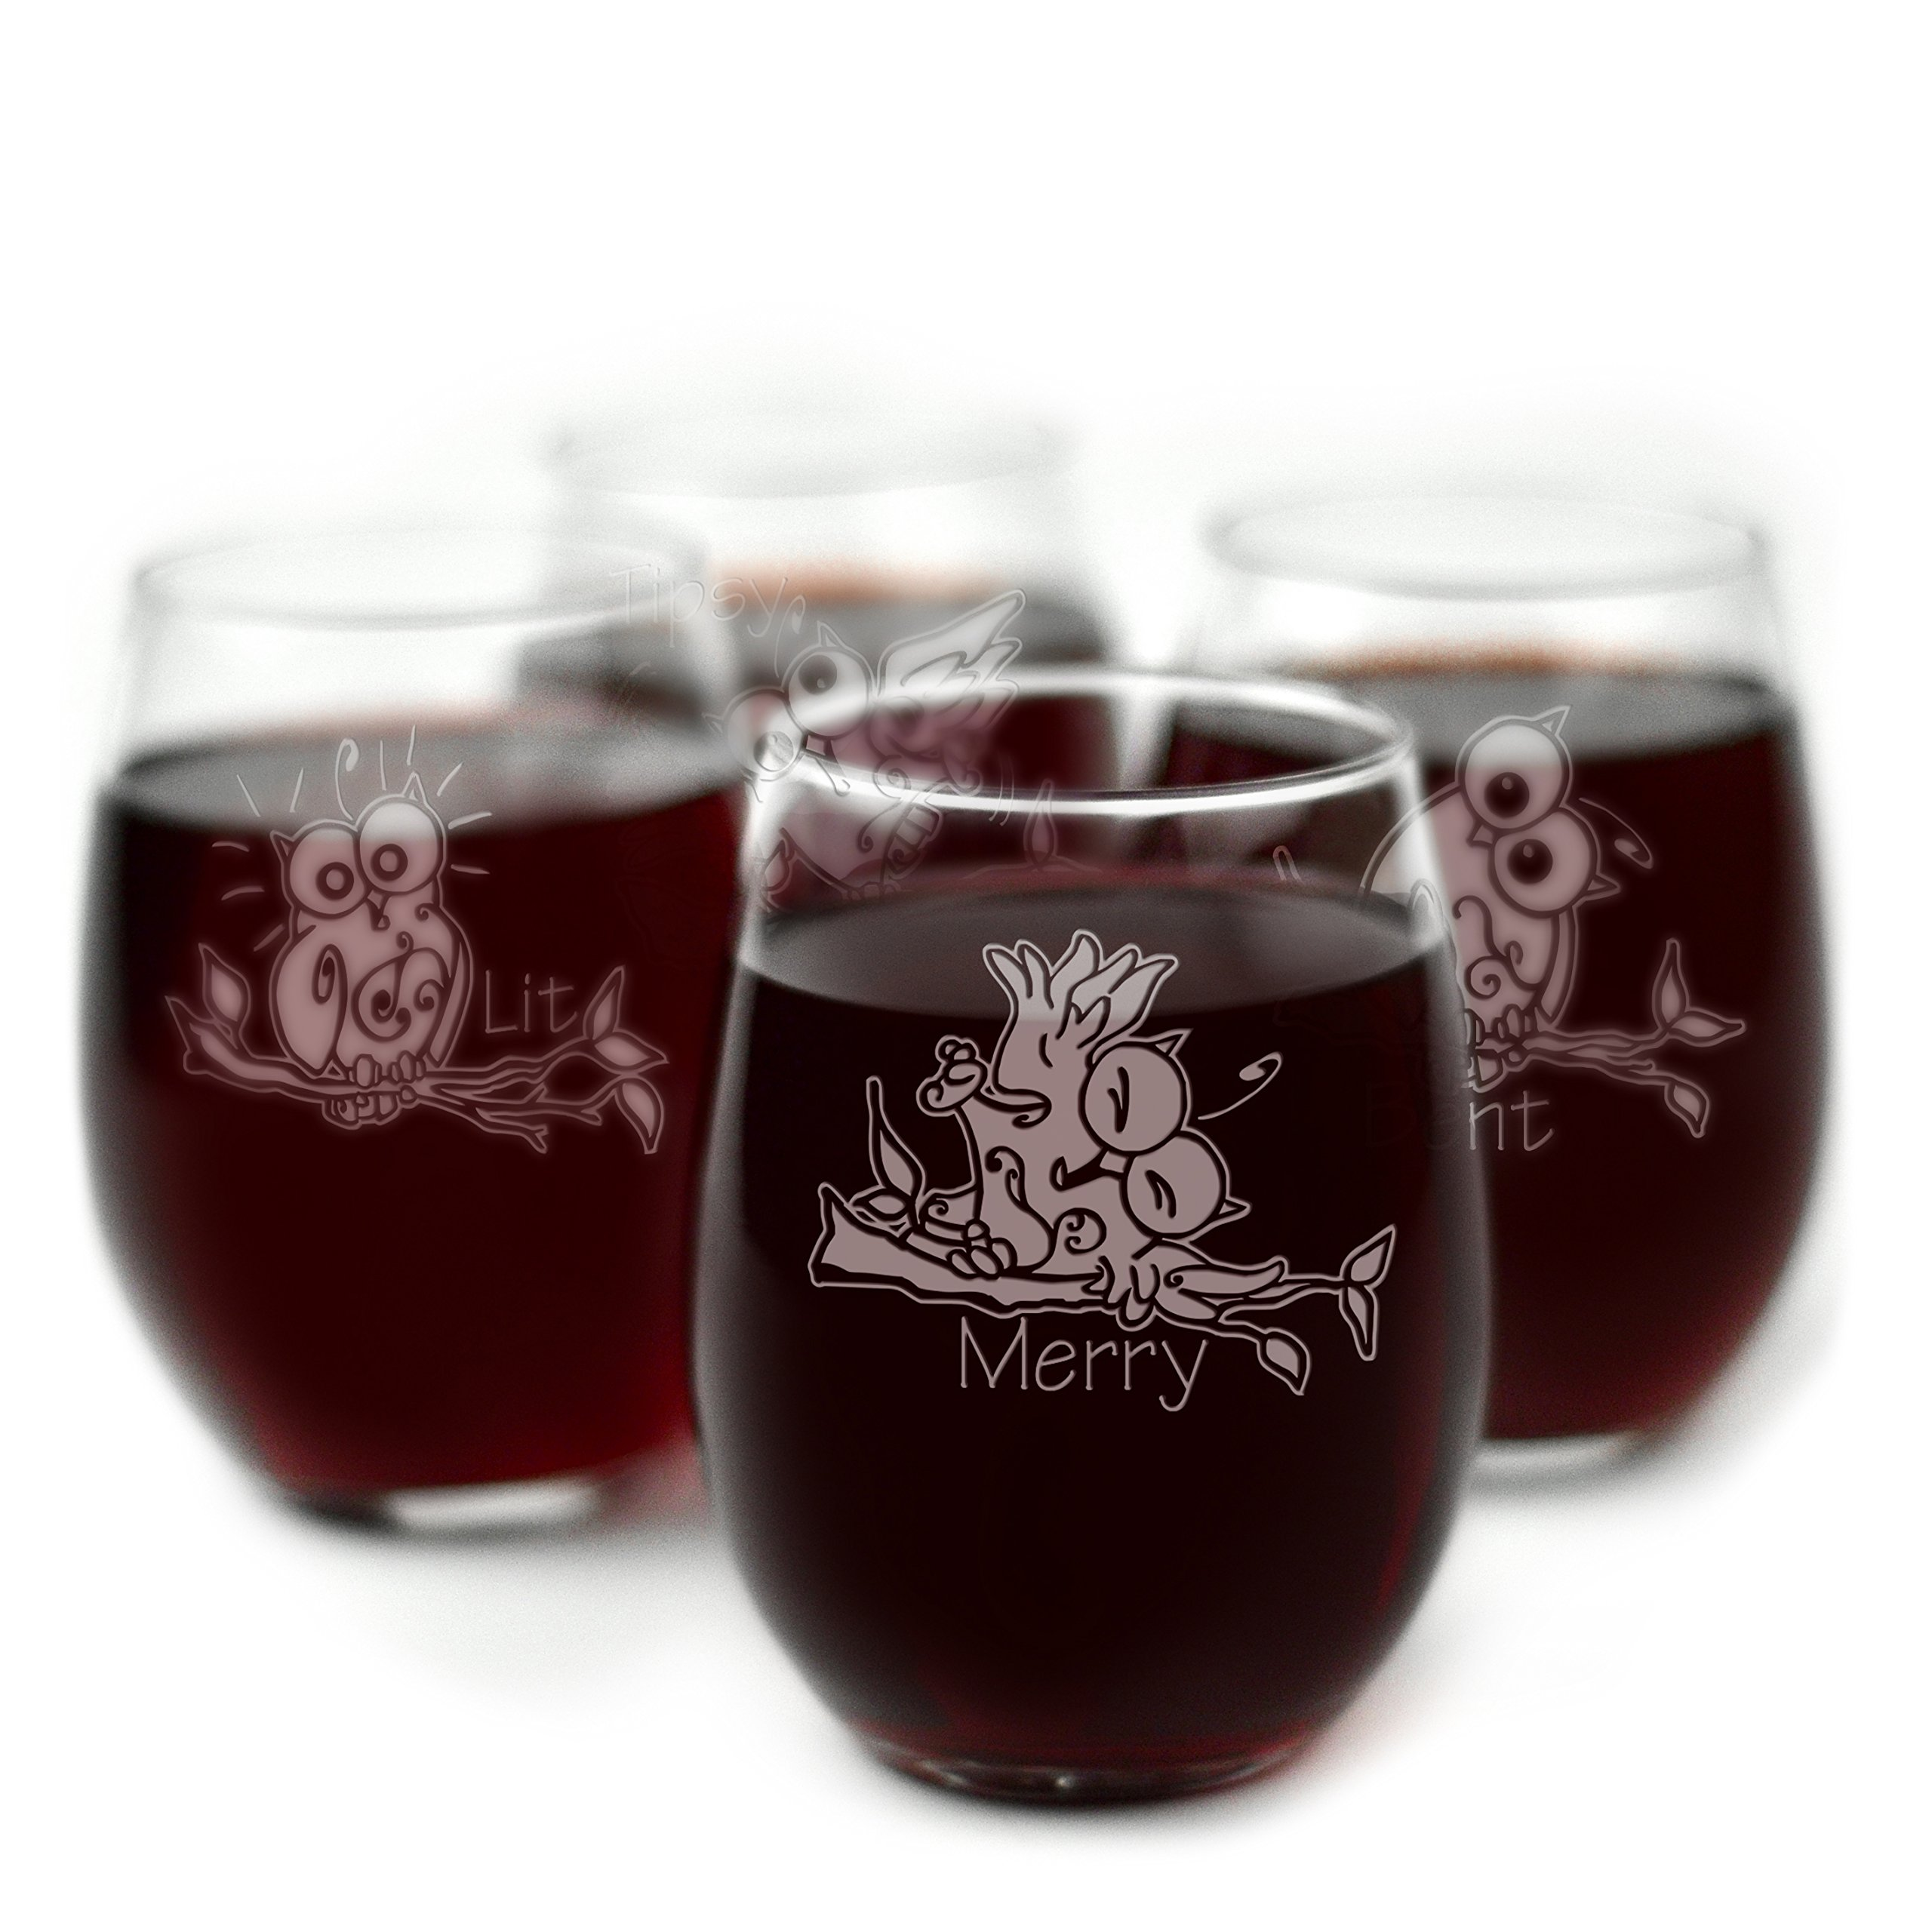 Drunk Owl Themed Engraved Stemless Wine Glasses - Set of 4